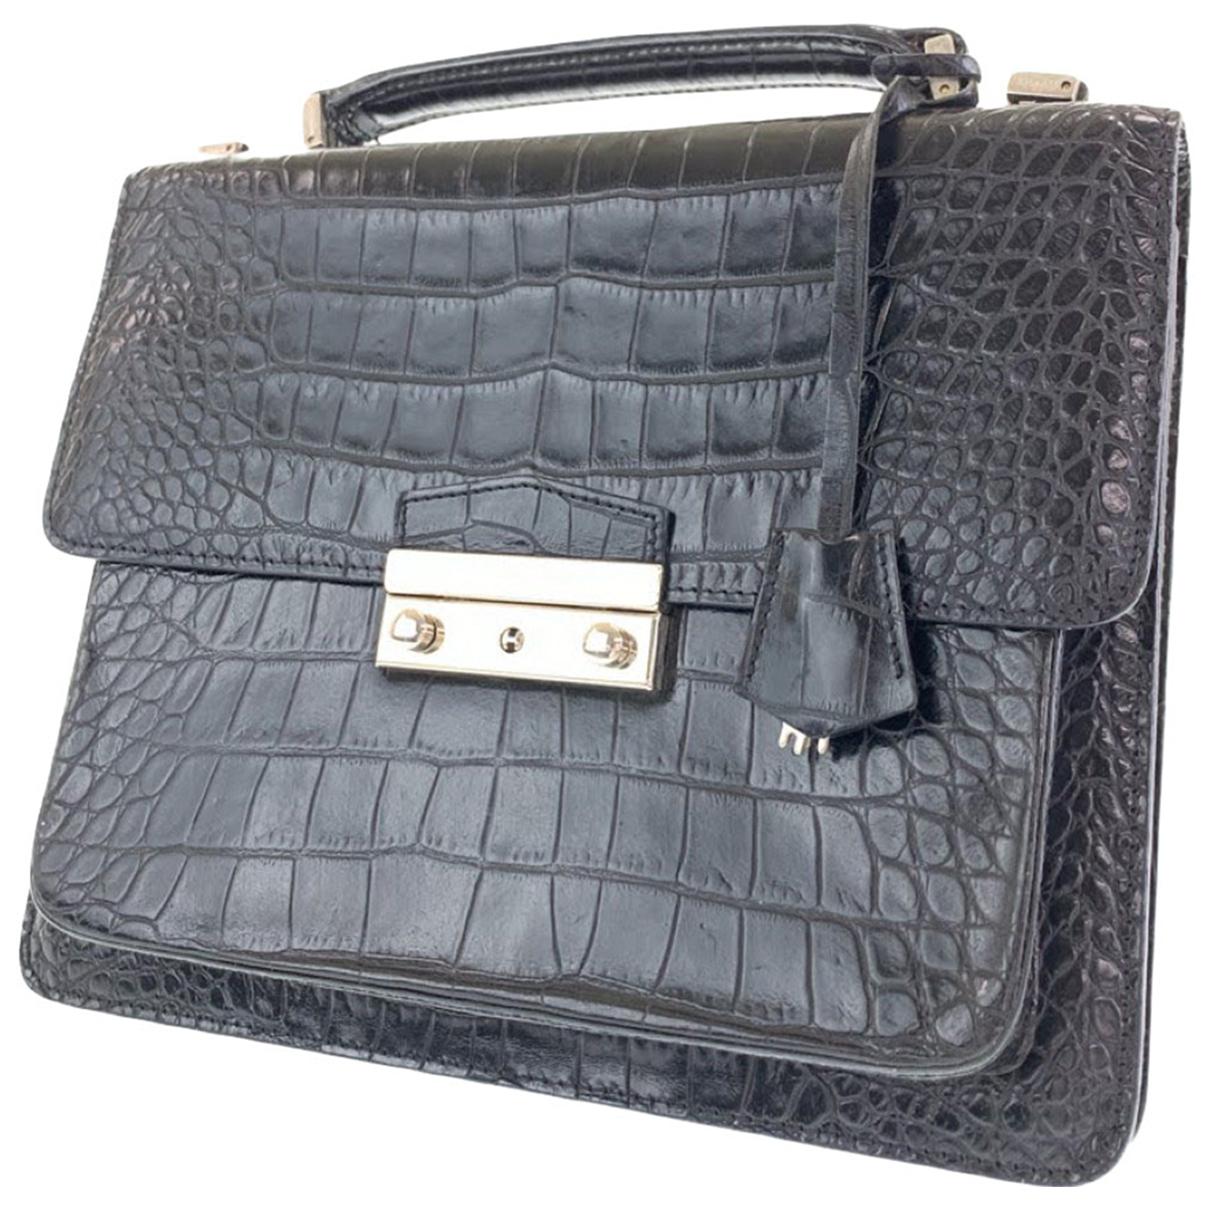 Gianni Versace - Sac a main   pour femme en cuir